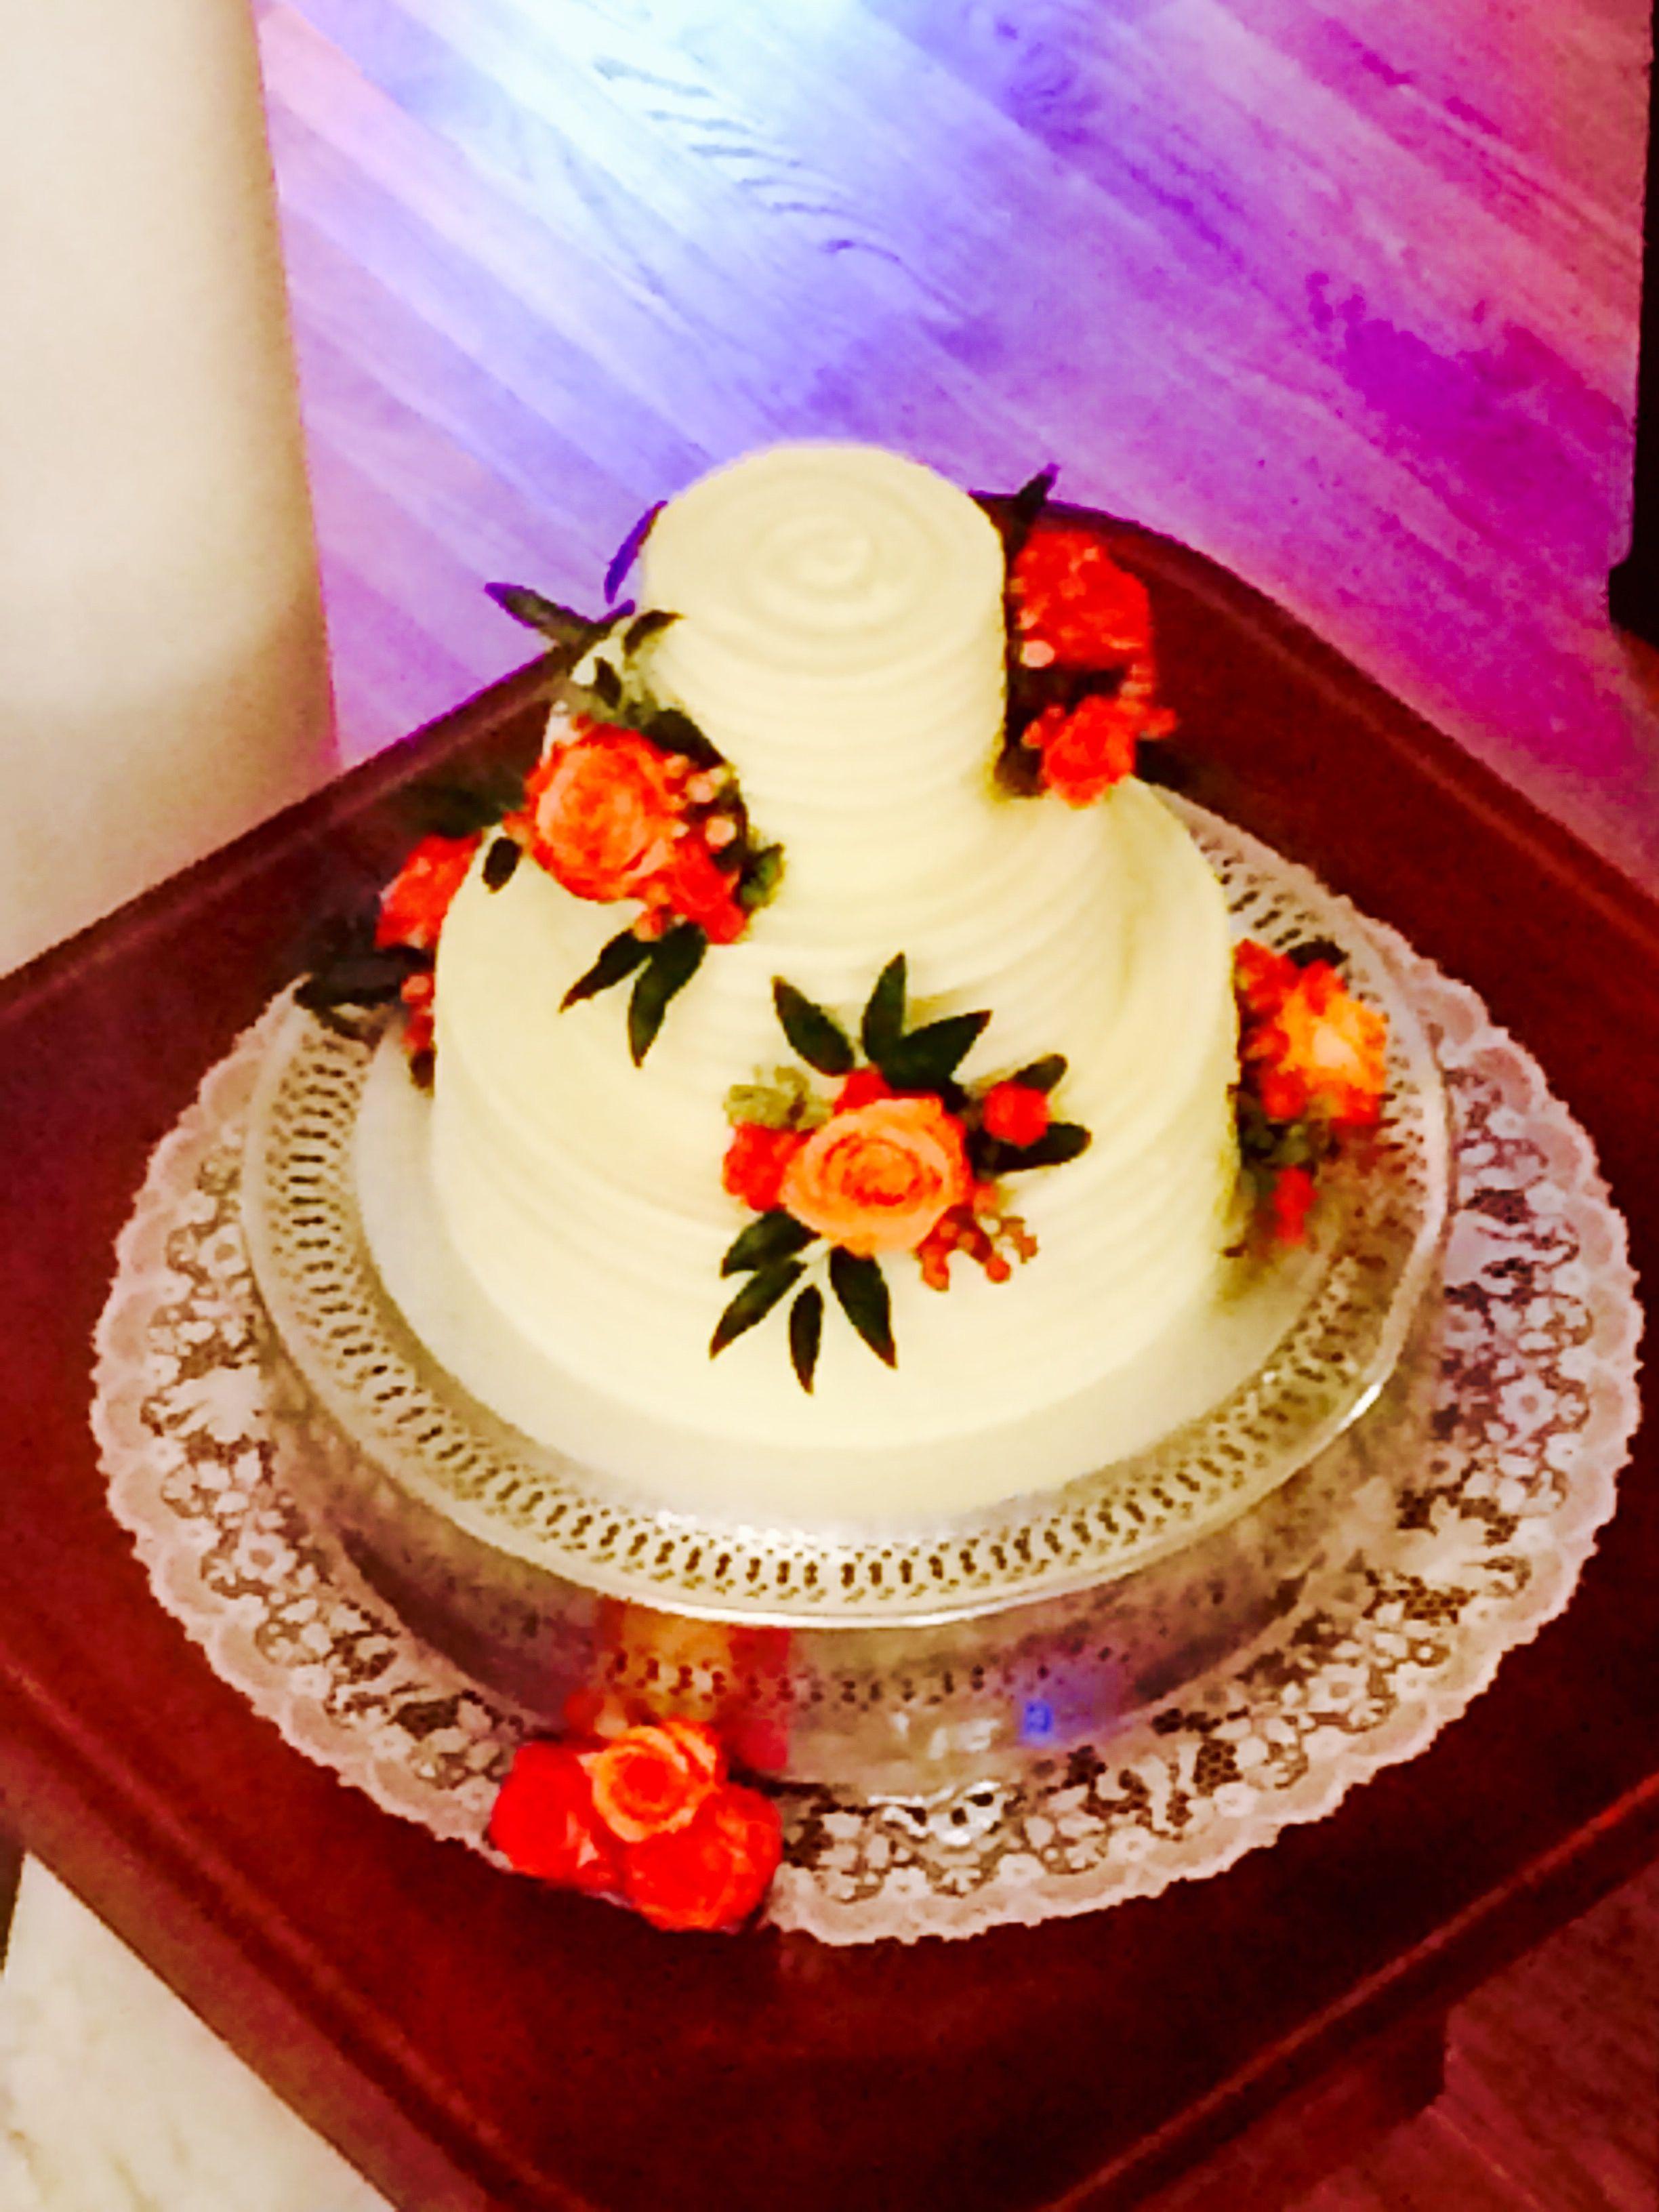 Wedding Cake Bakeries Huntsville Al - 5000+ Simple Wedding Cakes